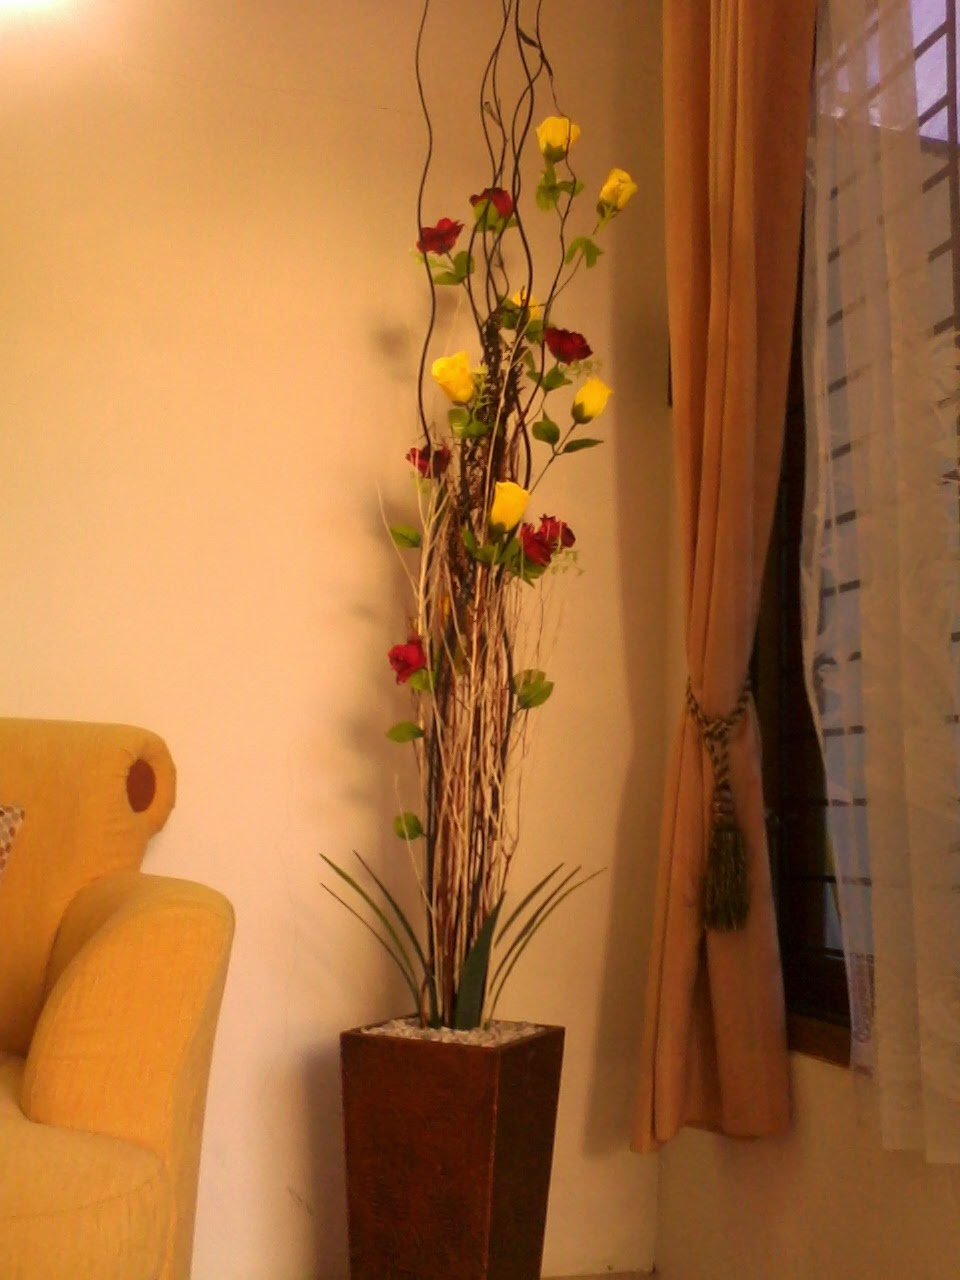 Pondok Dahar Lauk Jogja Foto Produk Kiriman Pelanggan Kami Rangkaian Bunga Meja Tamu Inspiratif Mempercantik Ruangan You